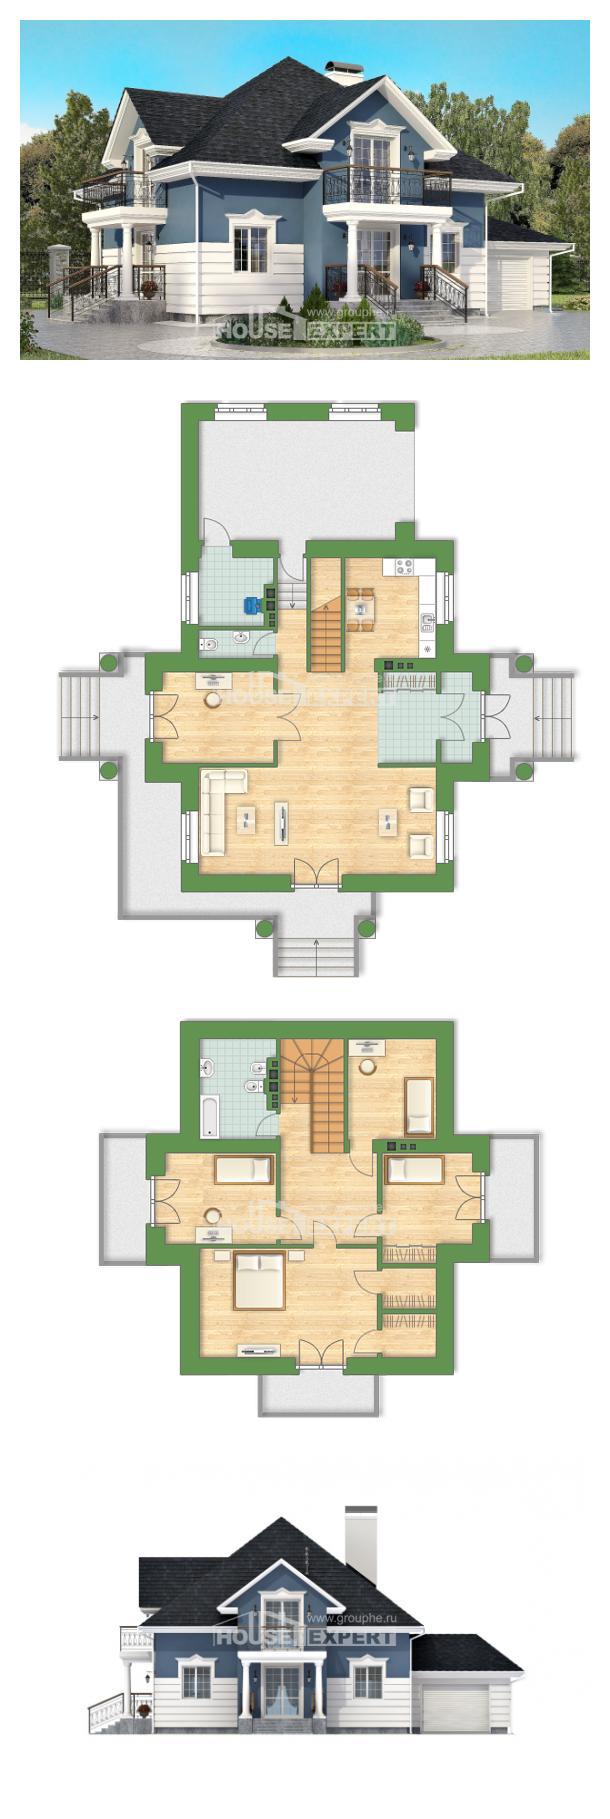 Ev villa projesi 180-002-R | House Expert